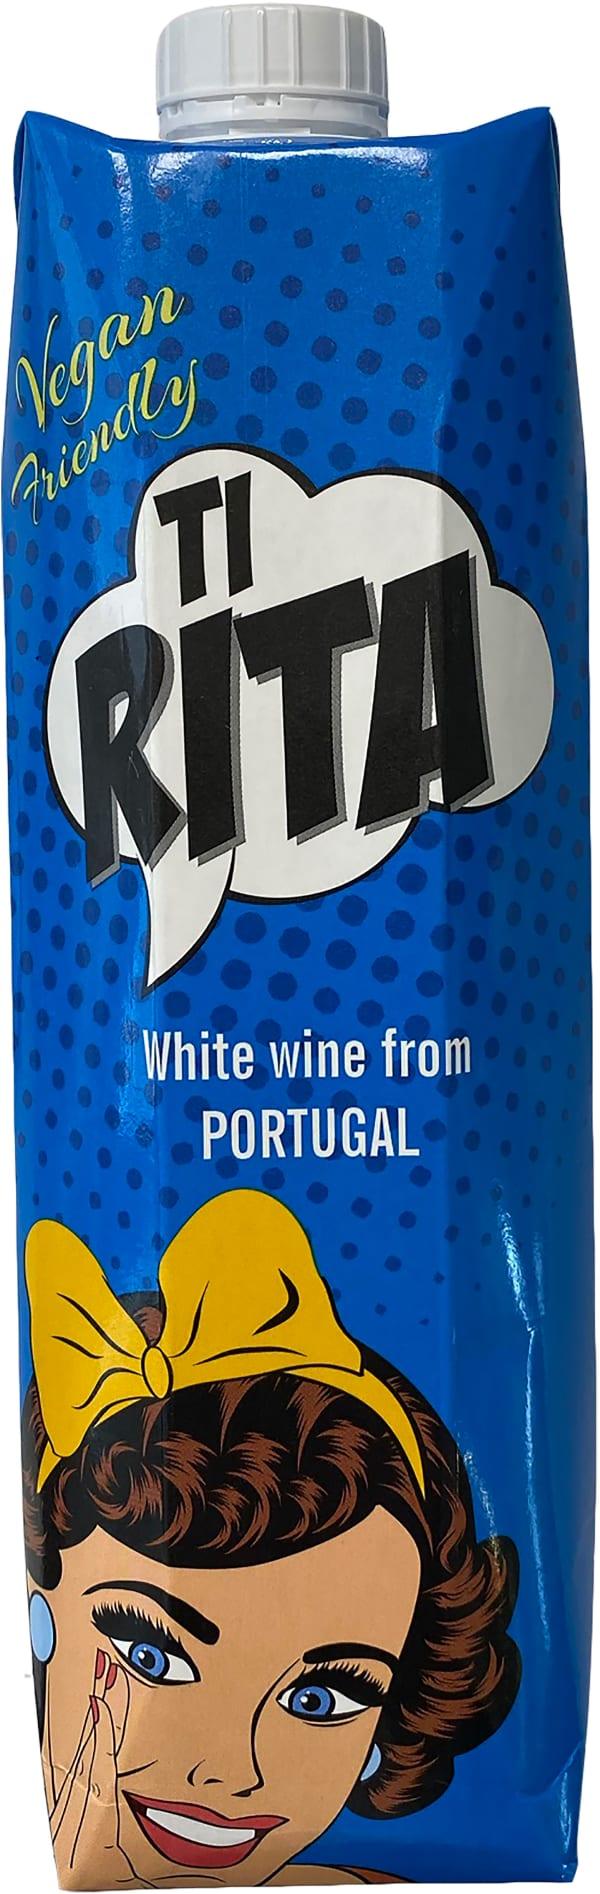 Ti Rita 2020 kartongförpackning